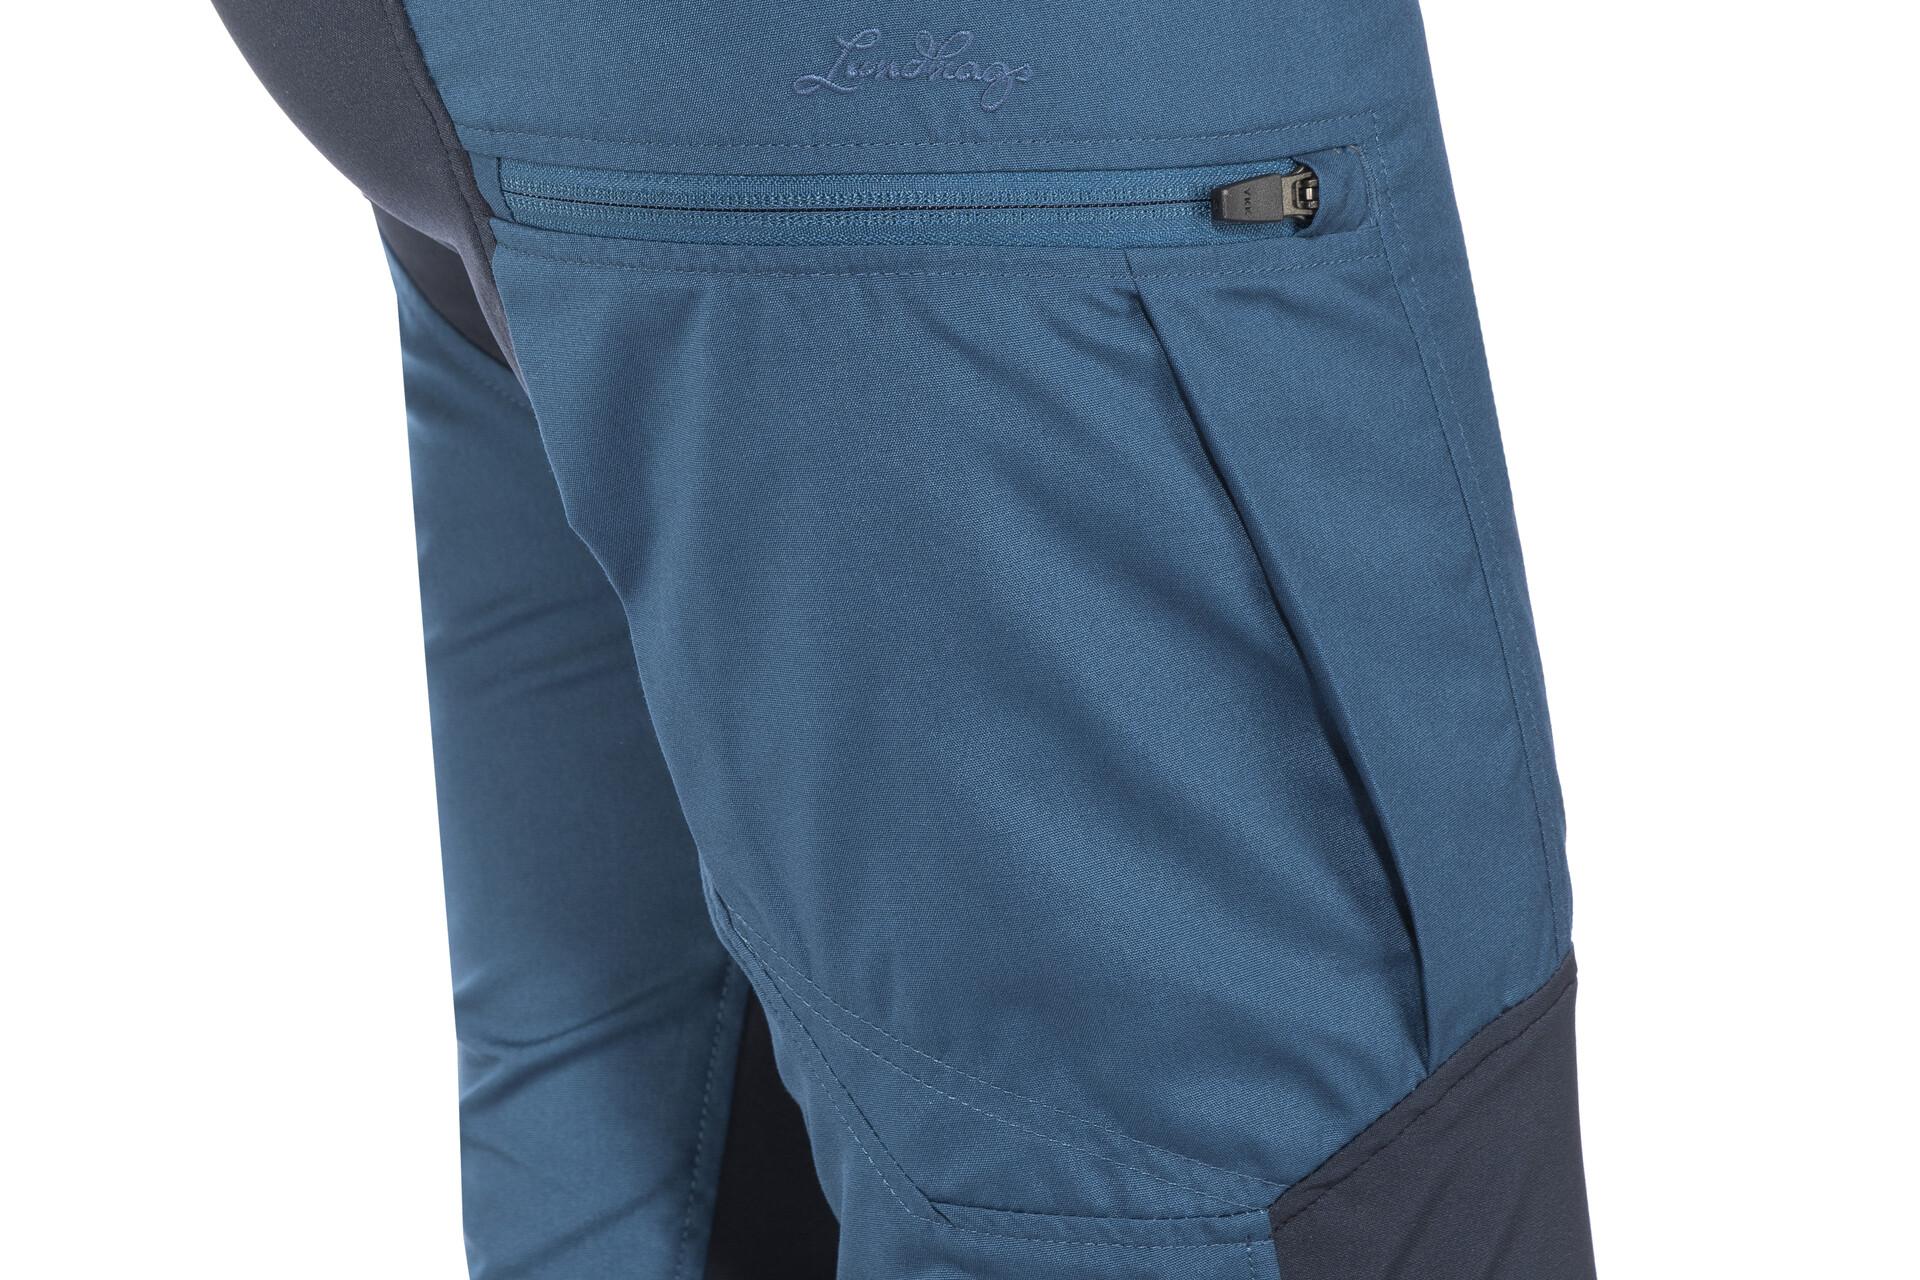 Lundhags Lundhags Lundhags W's Makke Pants Regular Petrol/Deep Blå bb79f9